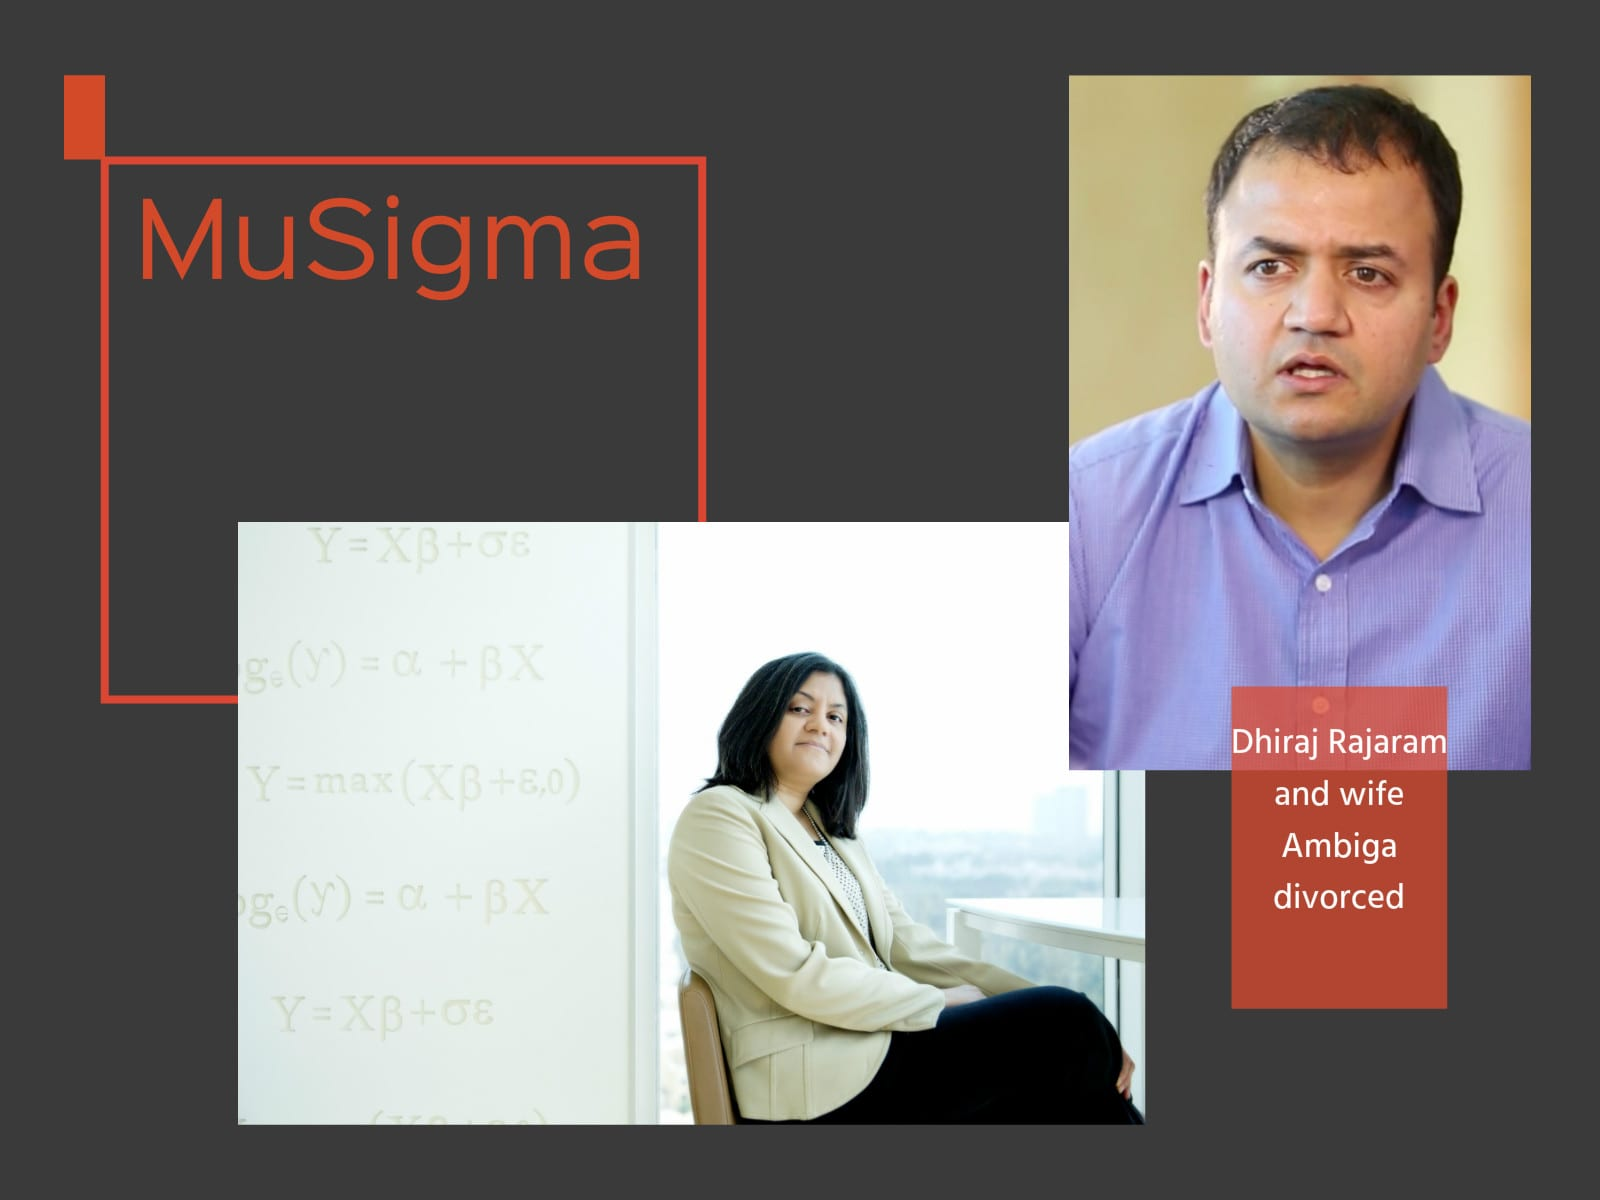 Mu Sigma head Dhiraj Rajaram and wife Ambiga divorced, insists it won't affect the company